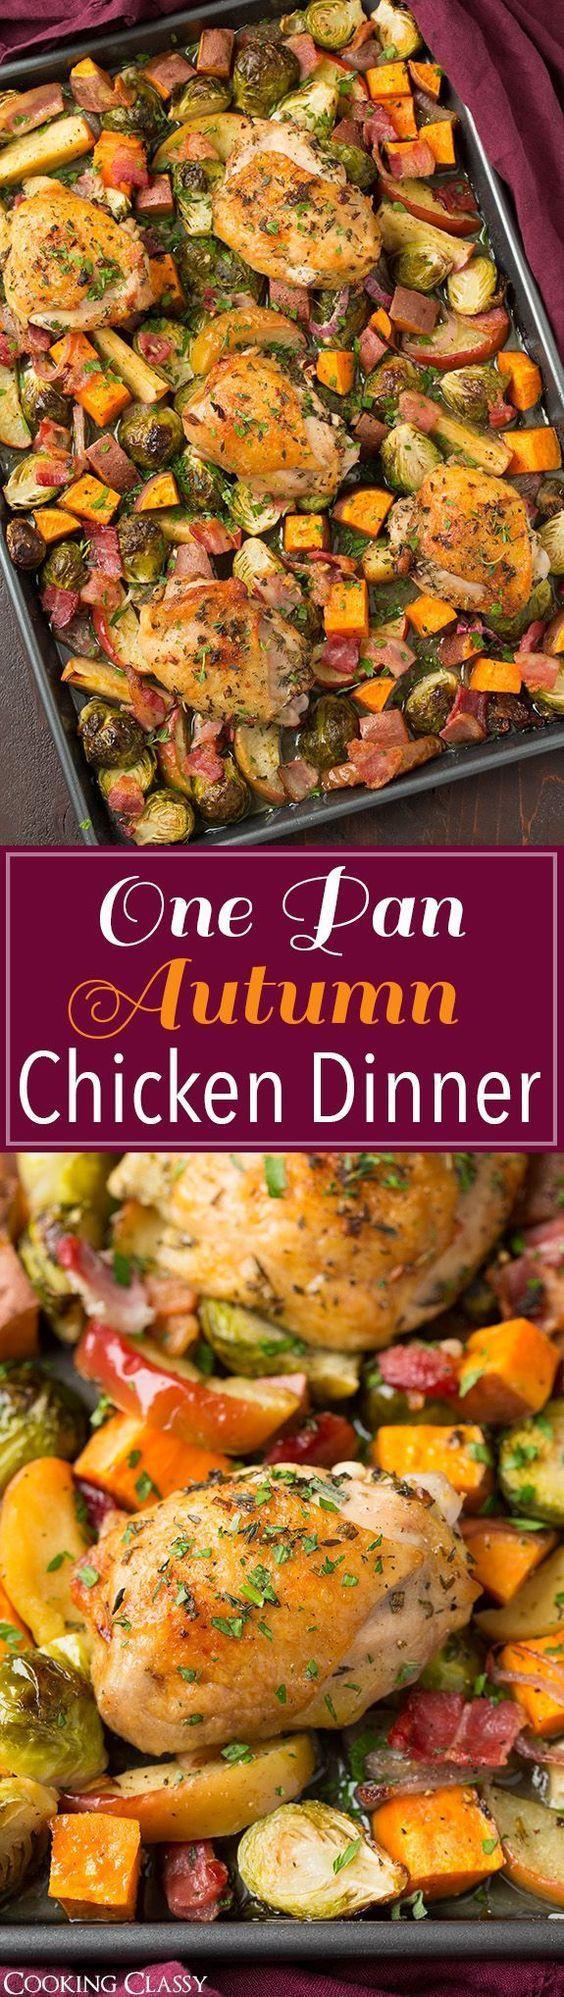 Healthy Fall Dinner Recipes  Best 25 Fall dinner recipes ideas on Pinterest